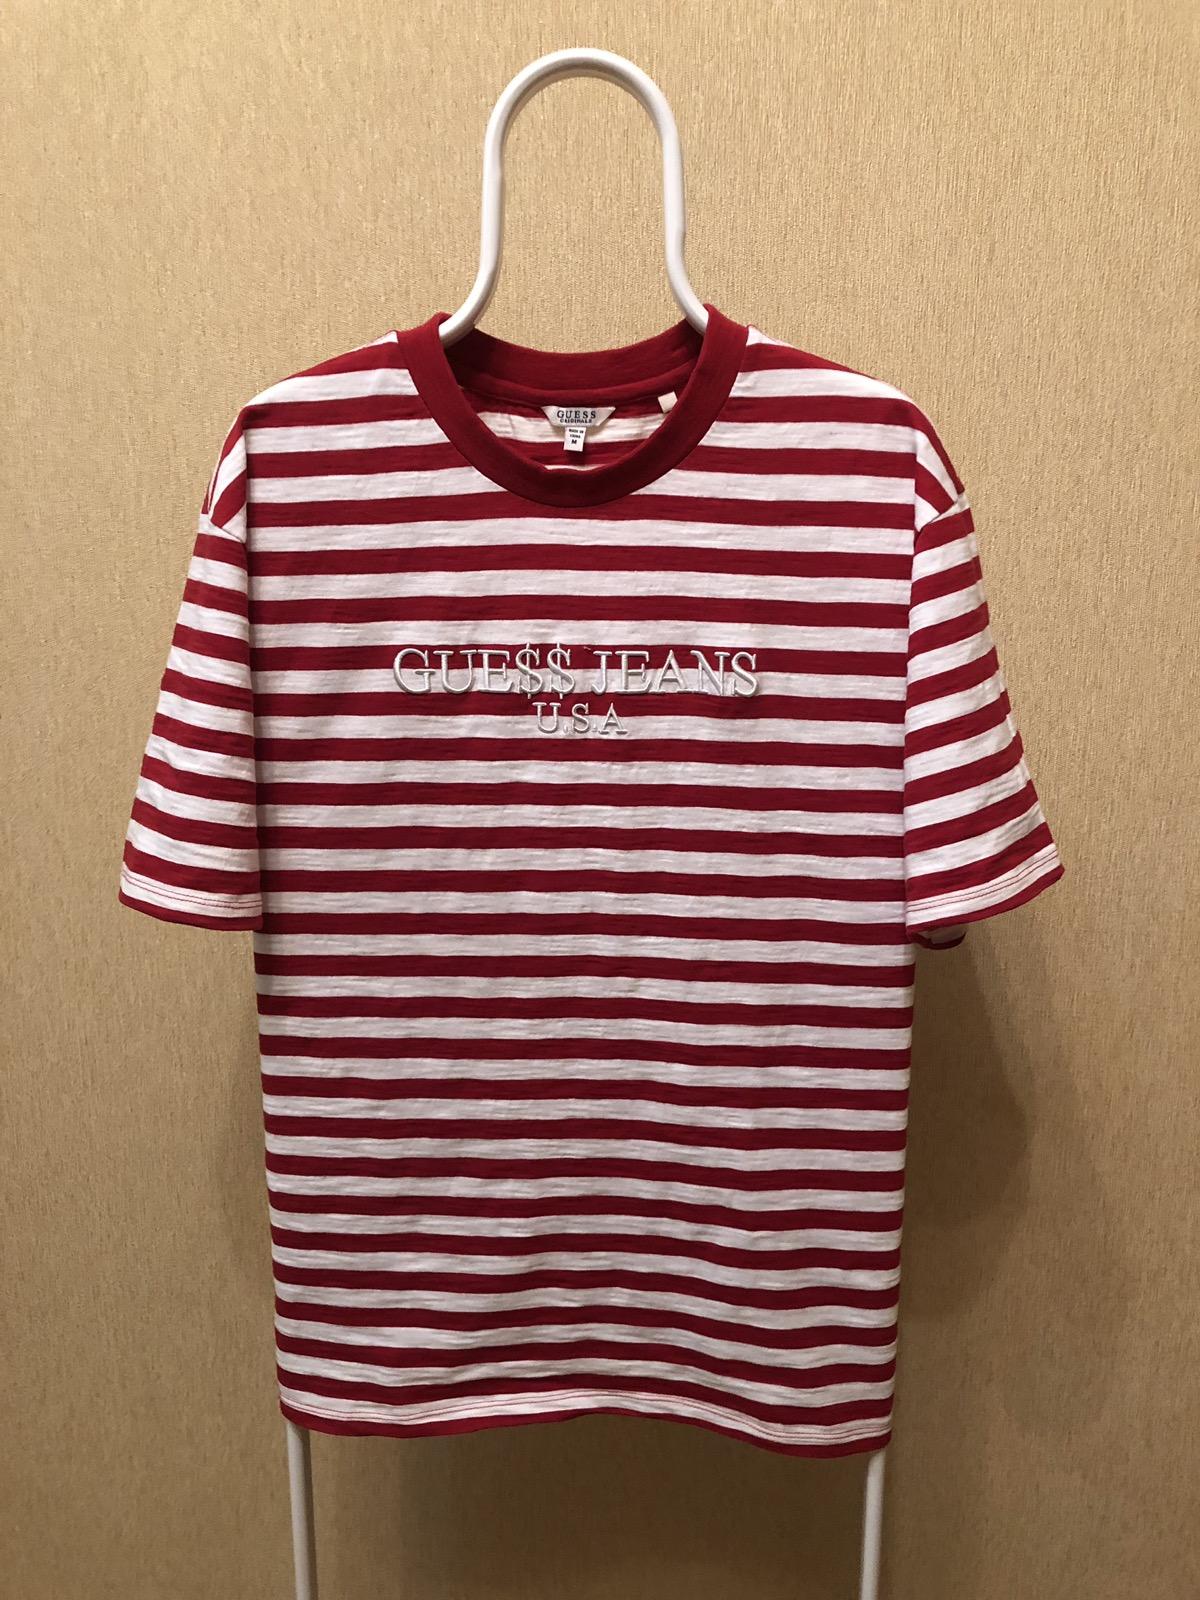 98a4e8f01117 Guess Jeans X Asap Rocky T Shirt | Saddha